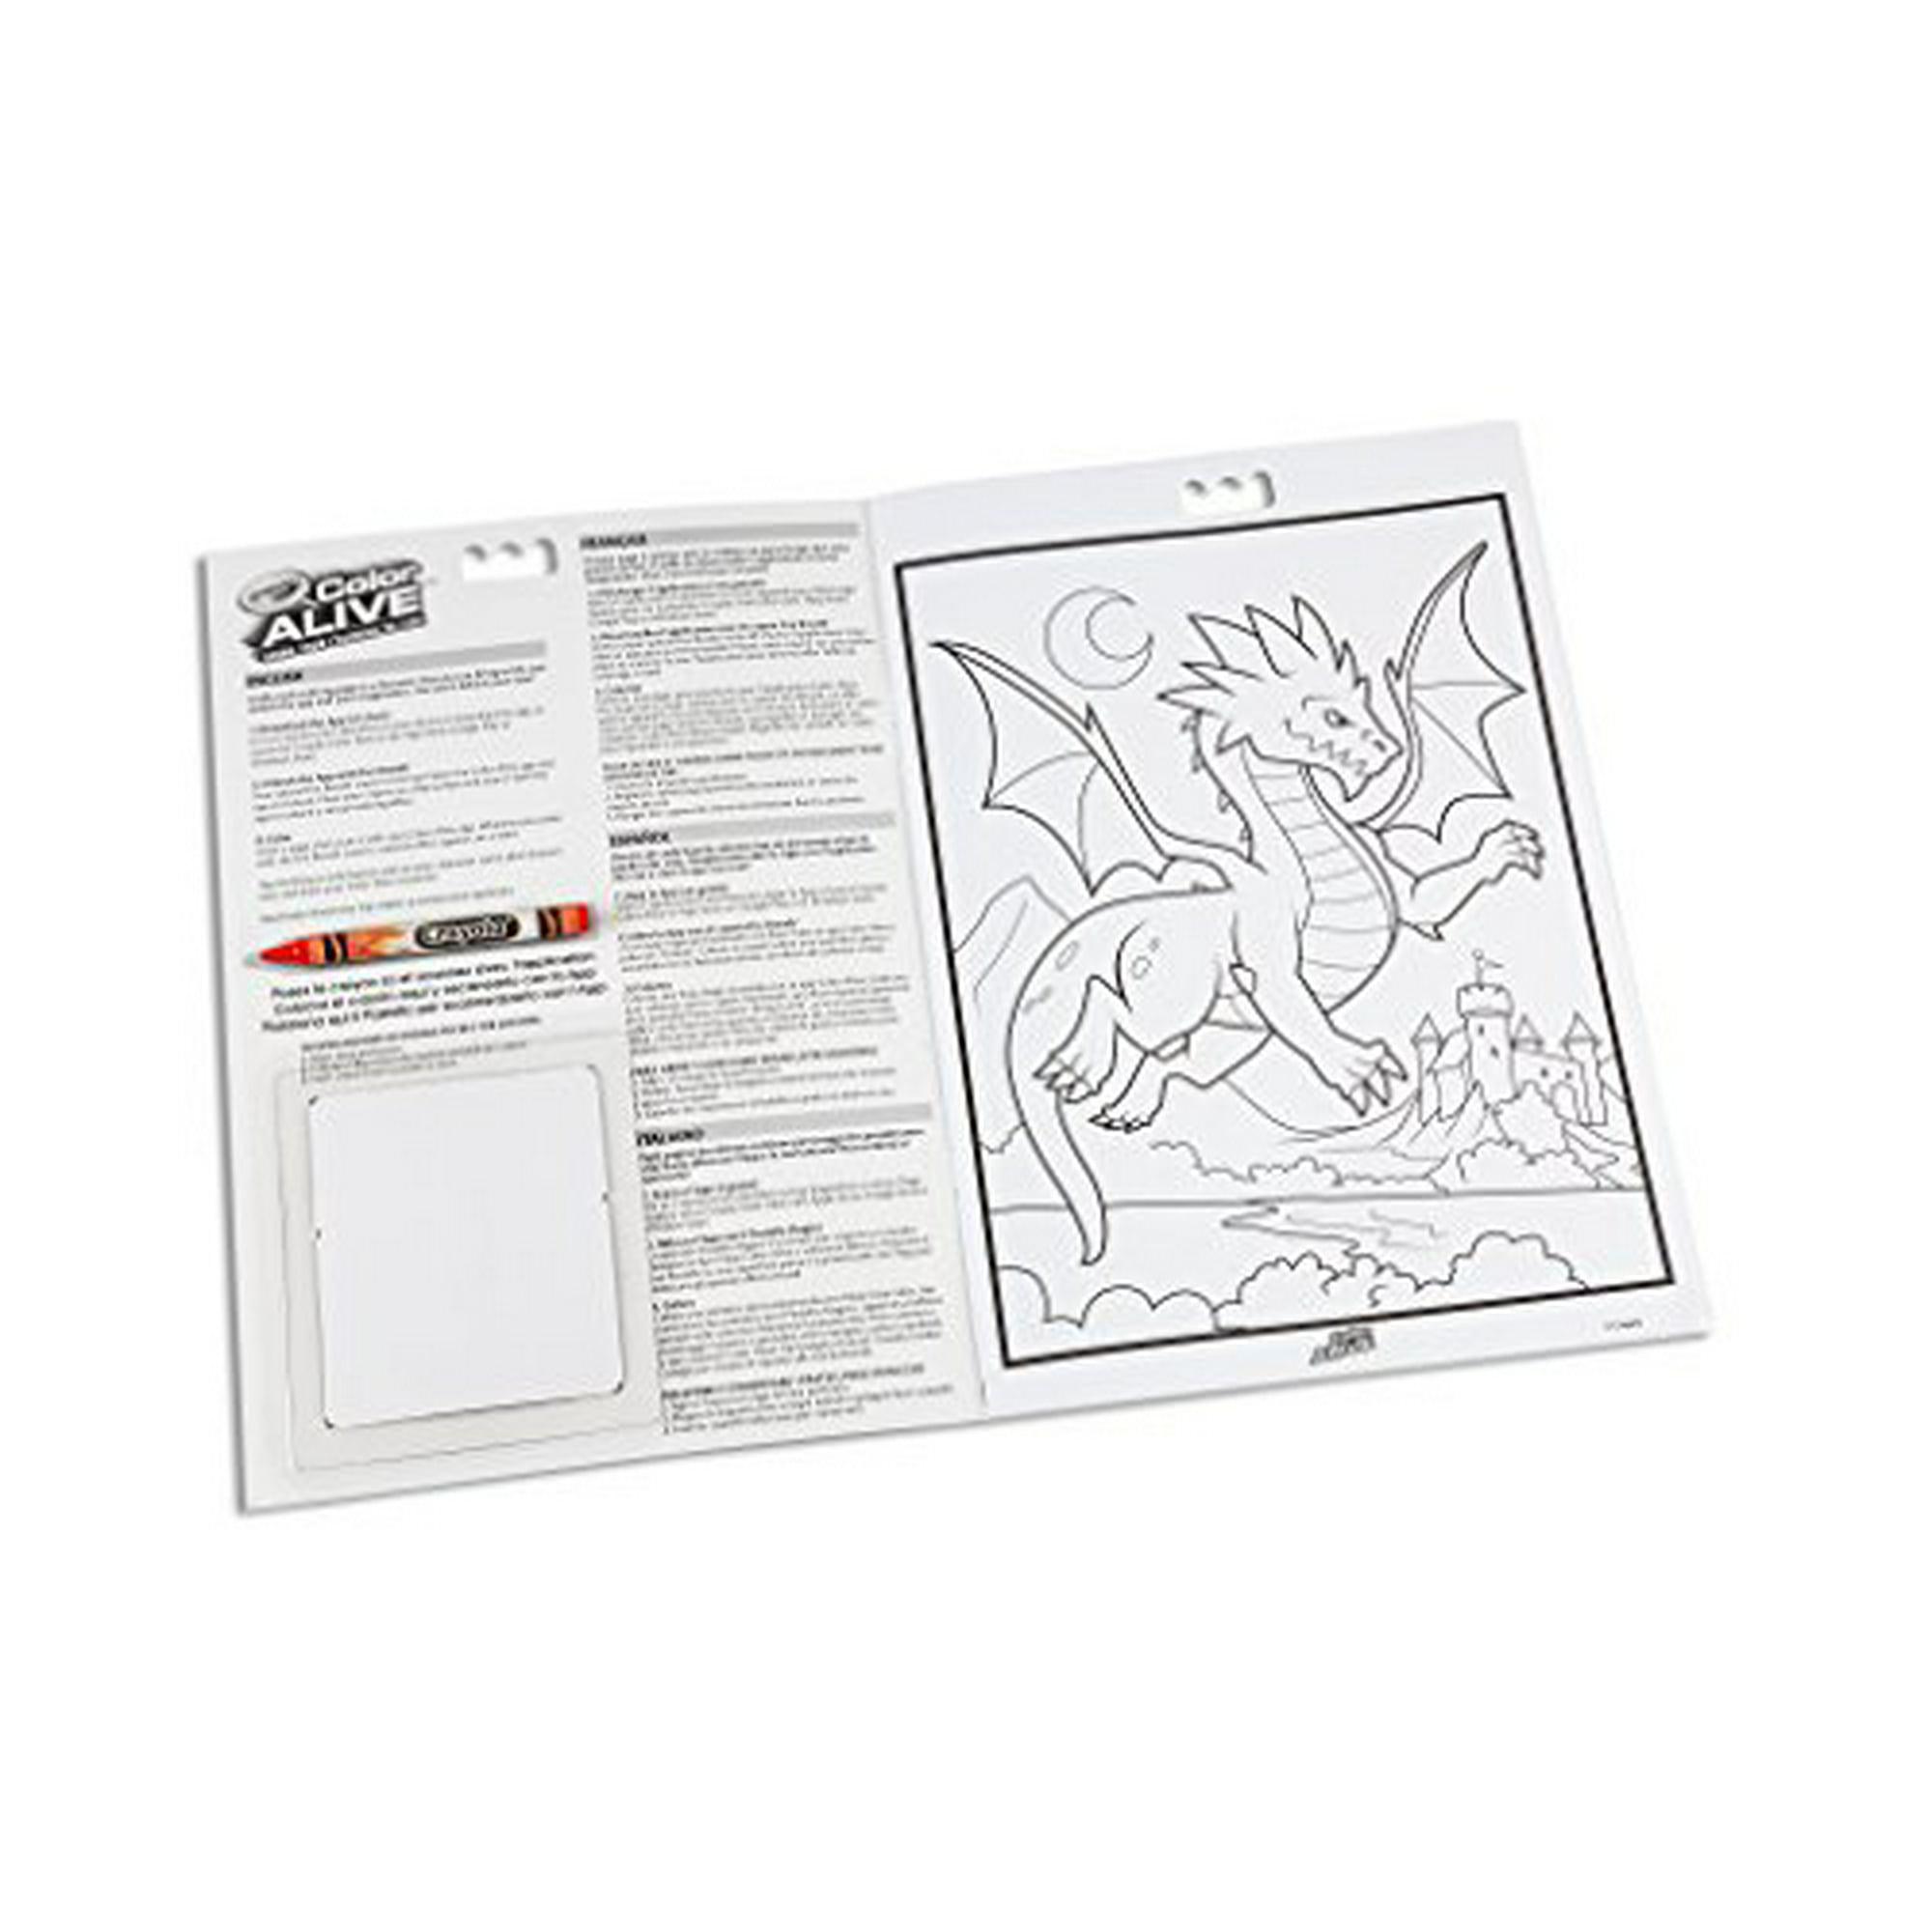 Pagani Huayra Coloring Page | Coloringpagez.com | 2000x2000